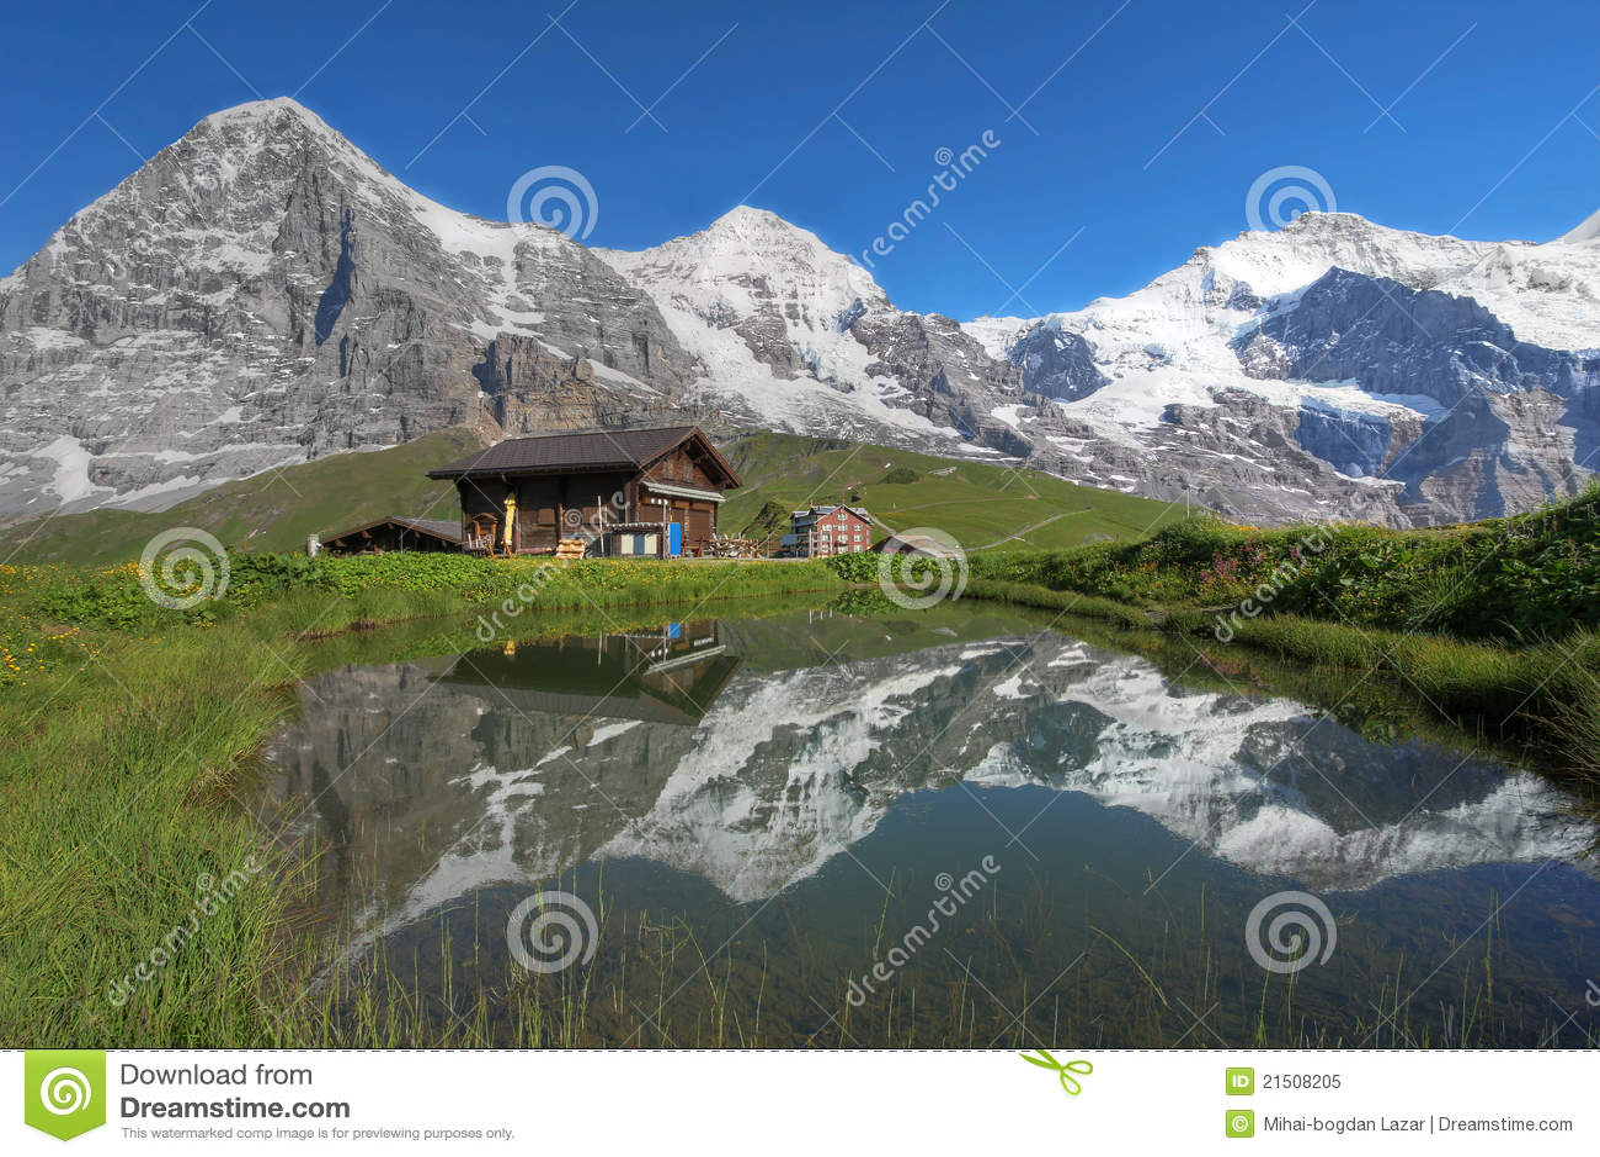 eiger monch jungfrau bernese alps switzerland royalty